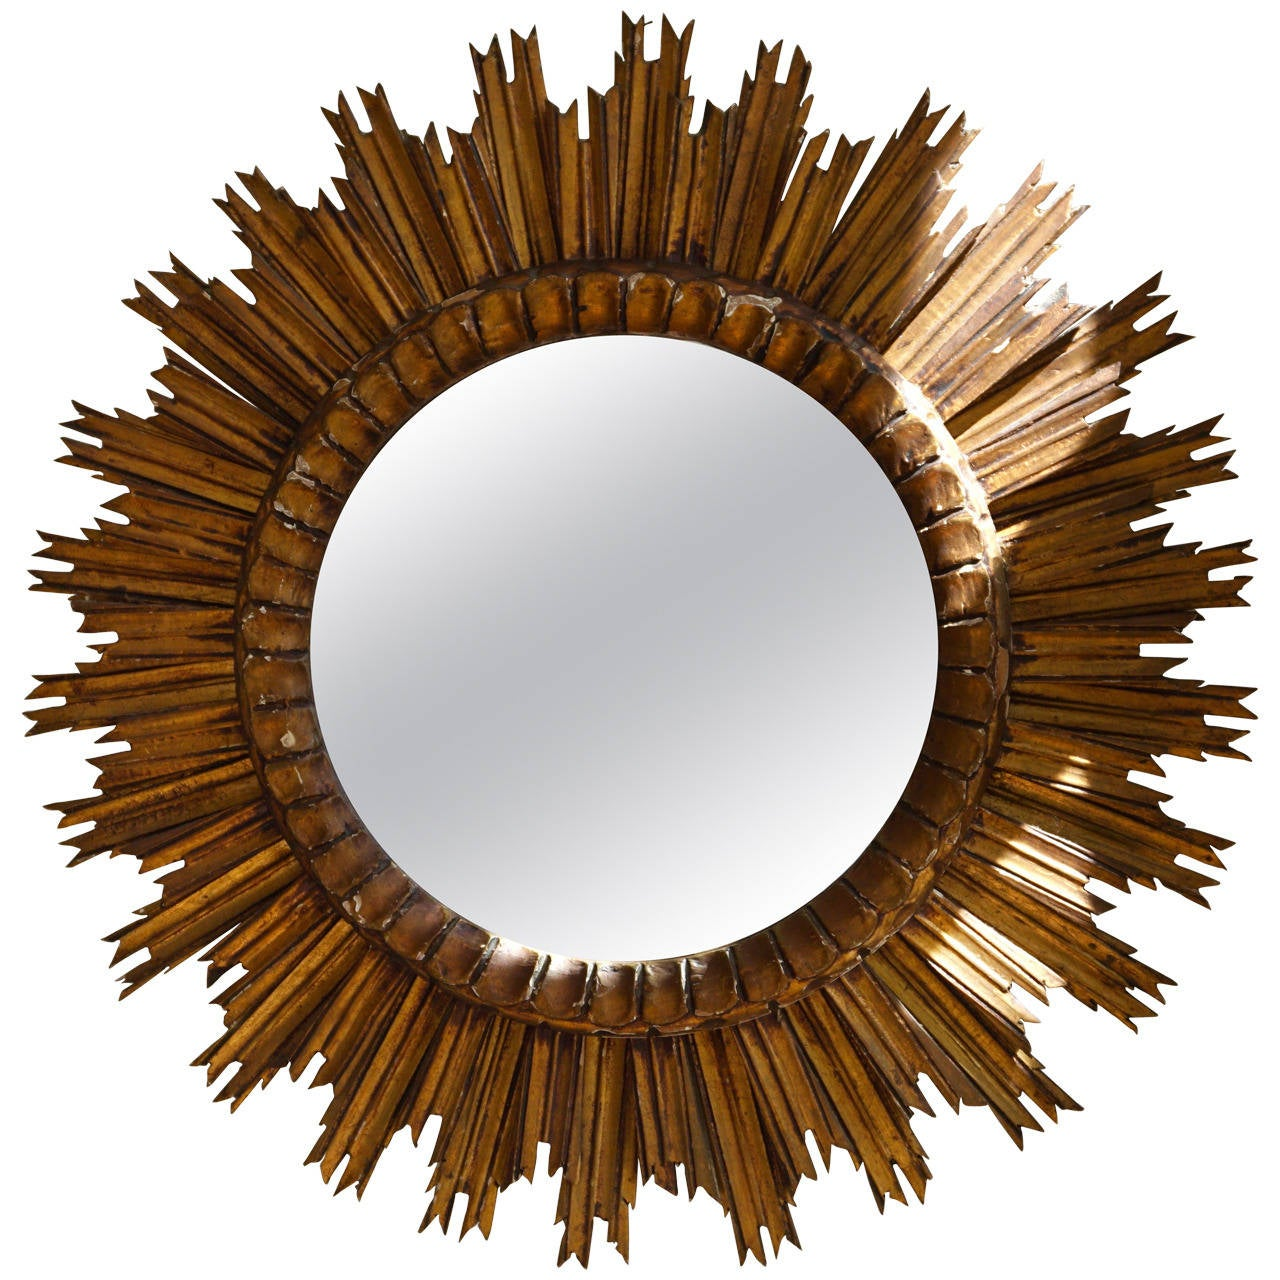 Italian 1930s Soleil Sunburst Giltwood Wall Mirror